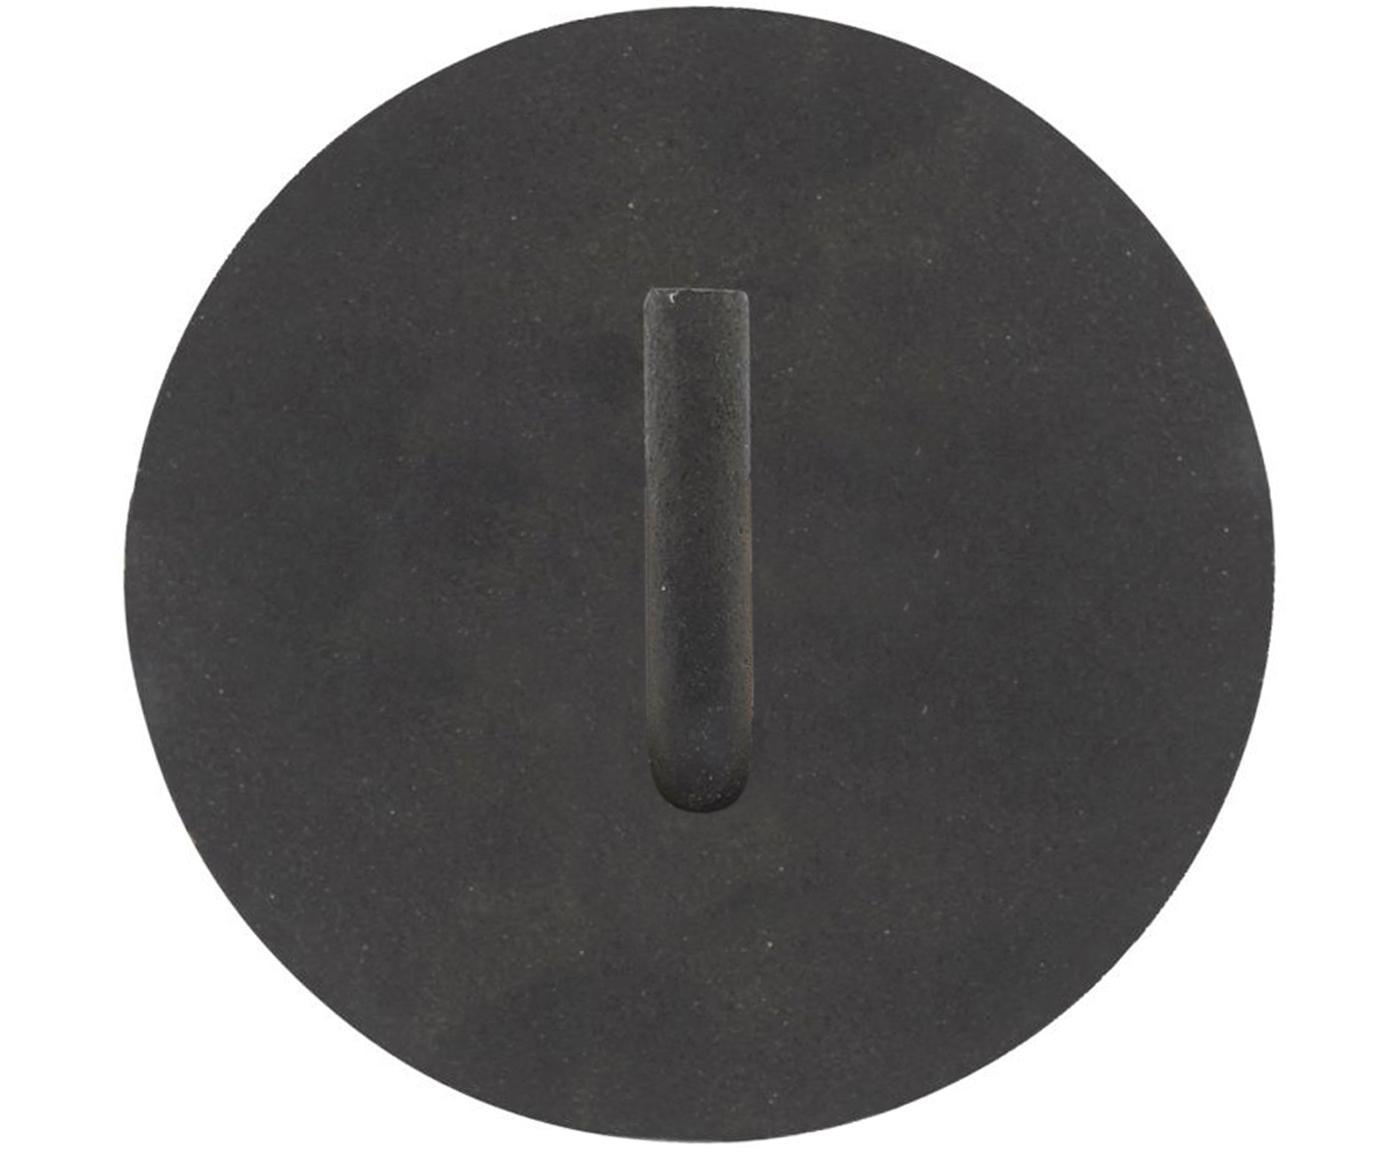 Wandhaak Lema, Gecoat aluminium, Zwart, Ø 13 x D 12 cm